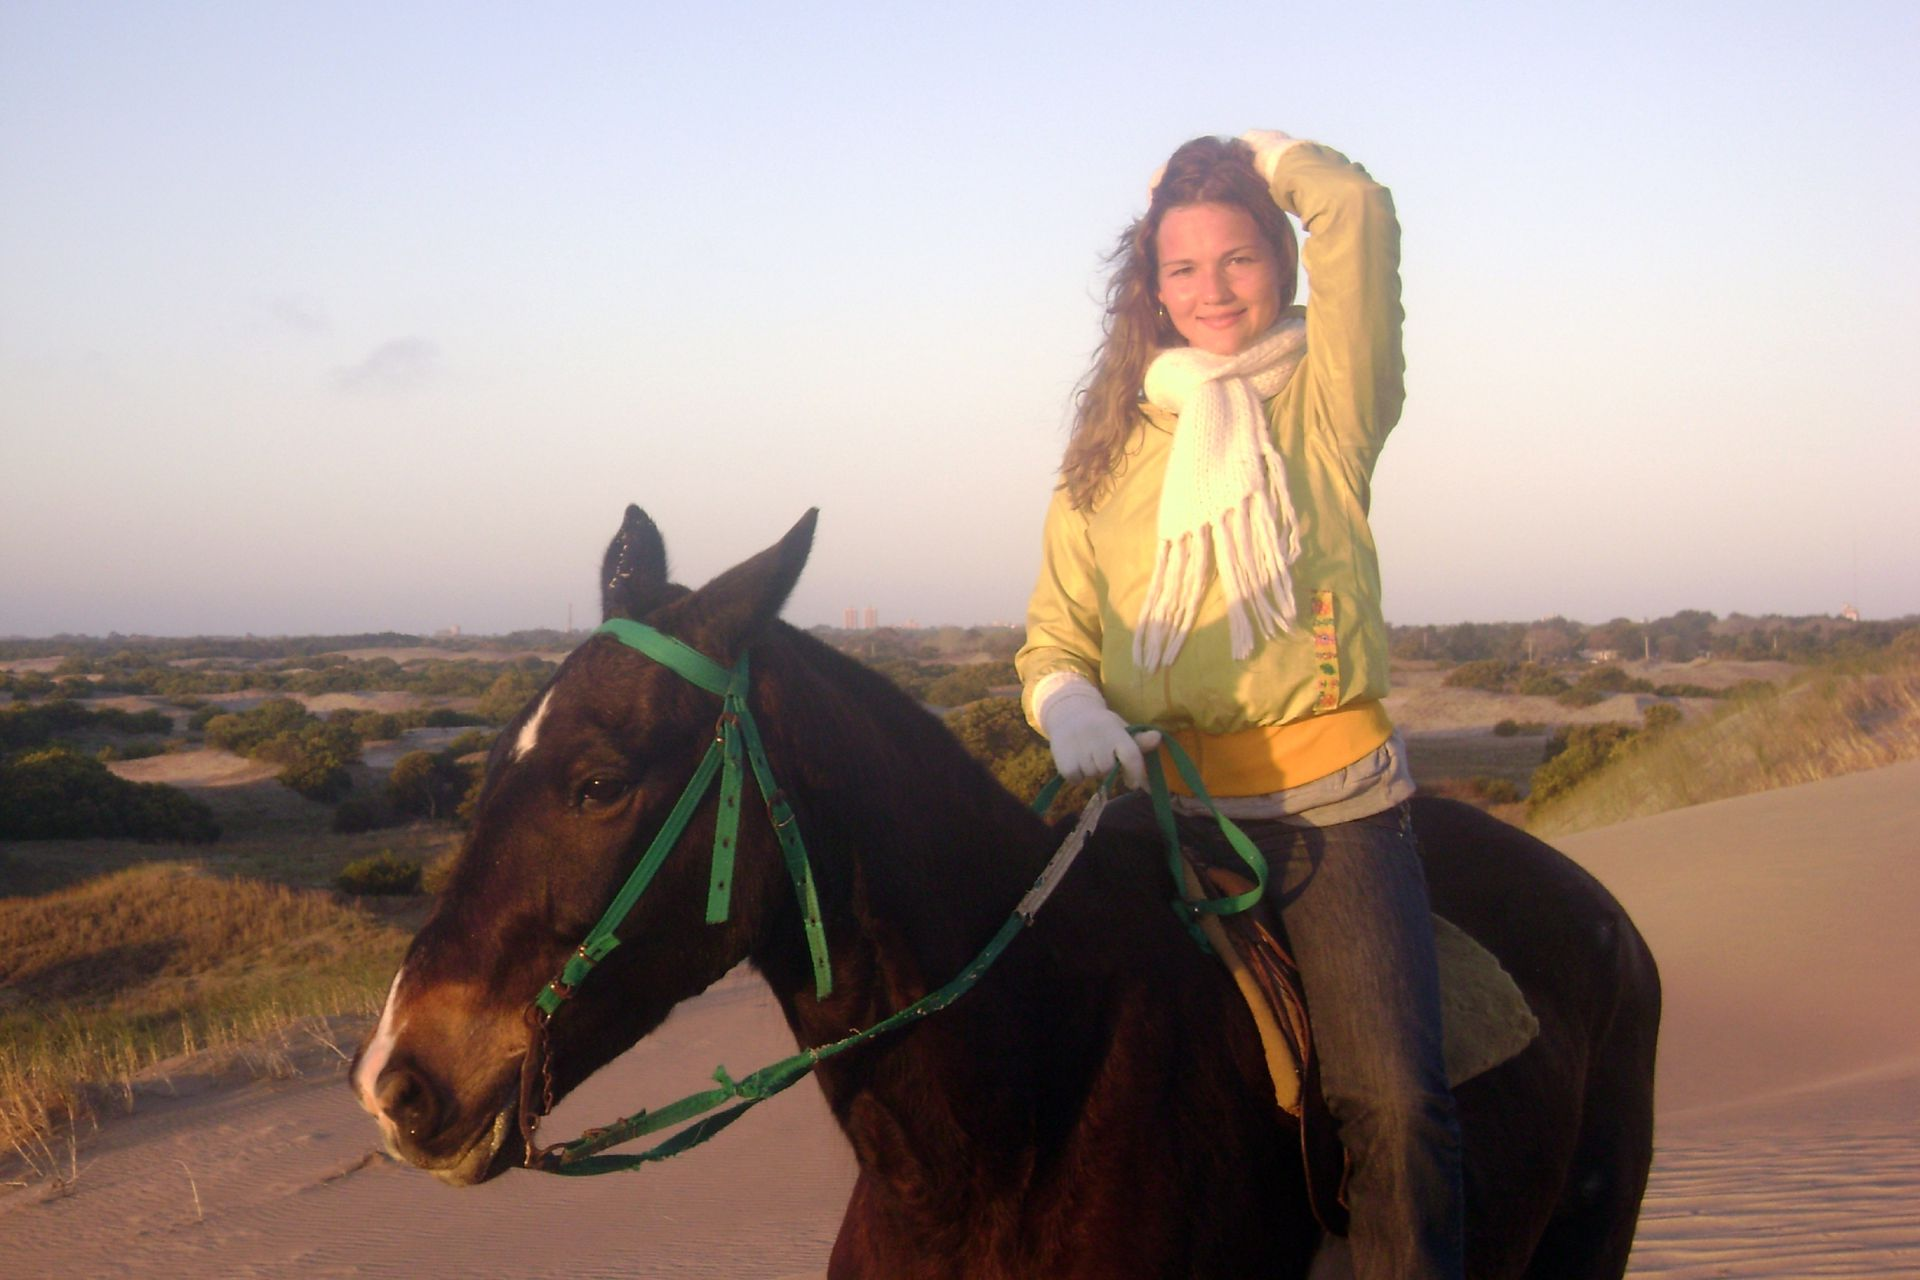 Ksenia, en la costa argentina.